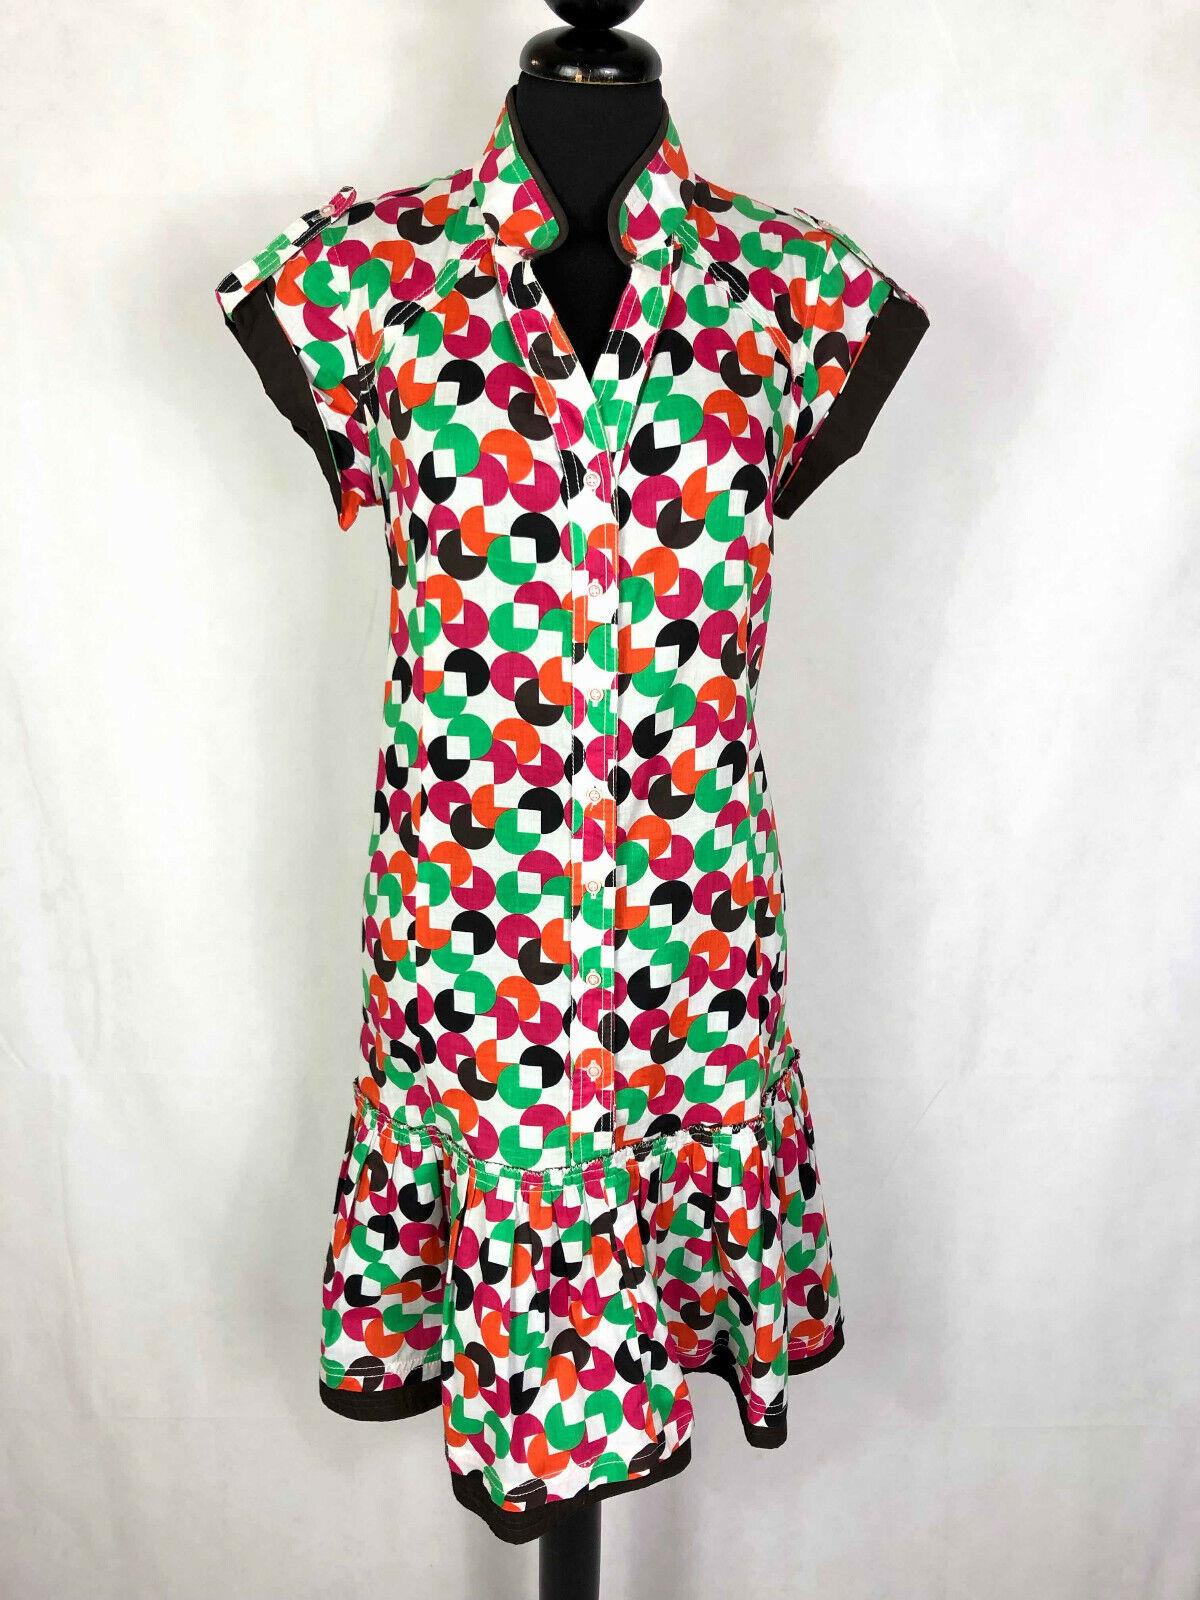 KENZO PARIS Abito Vestito damen Cotone Pois Balze Woman Cotton Dress Sz.S - 42